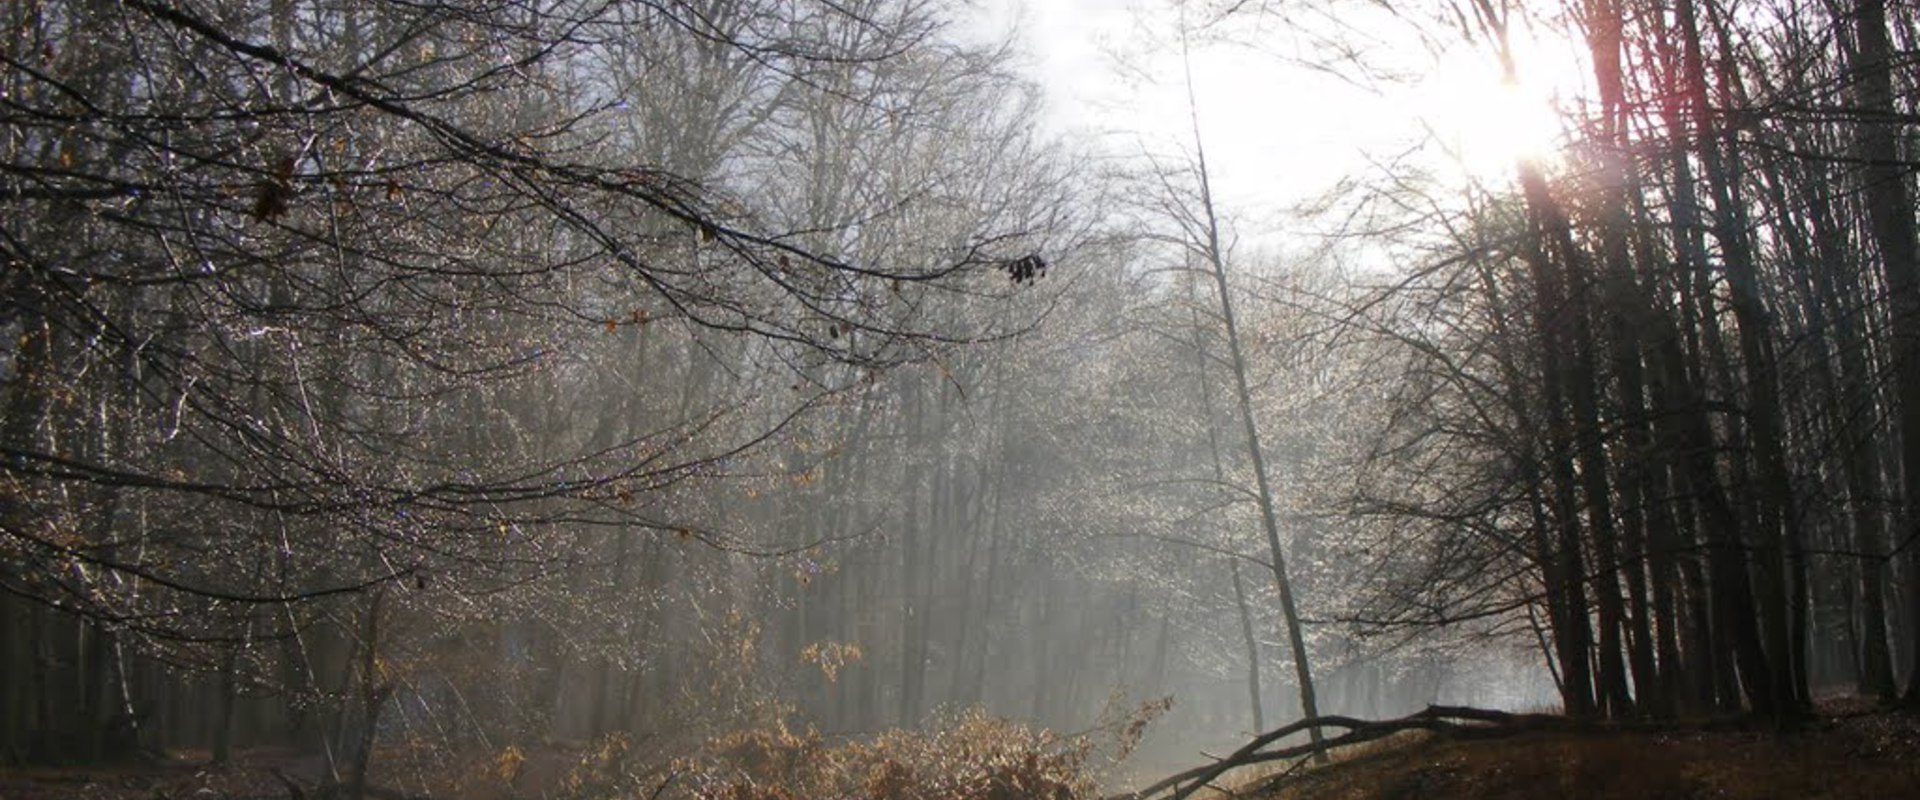 Öszpötei erdő